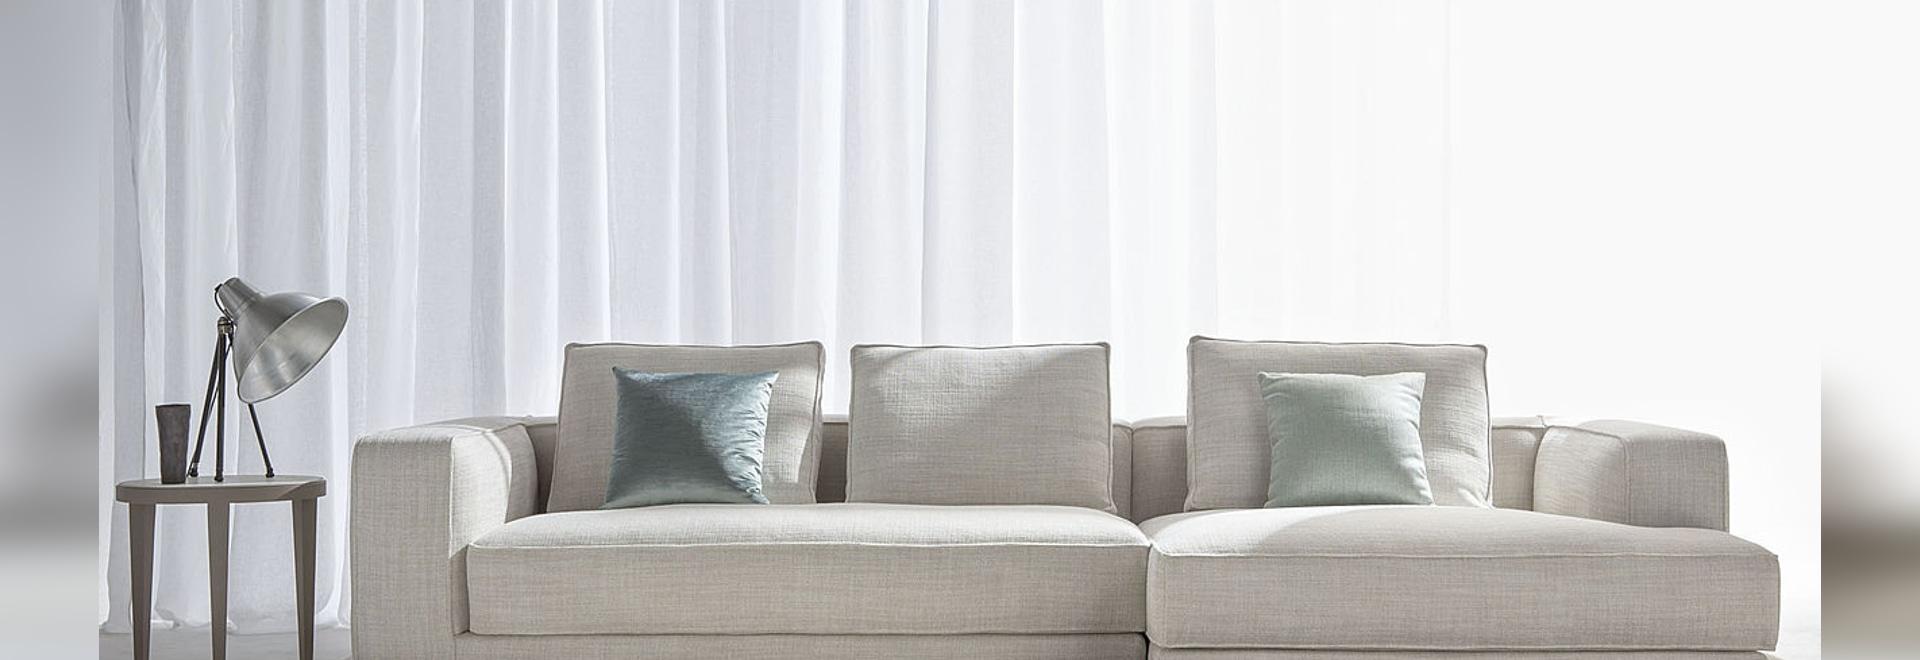 Christian, the new Berto sectional sofa